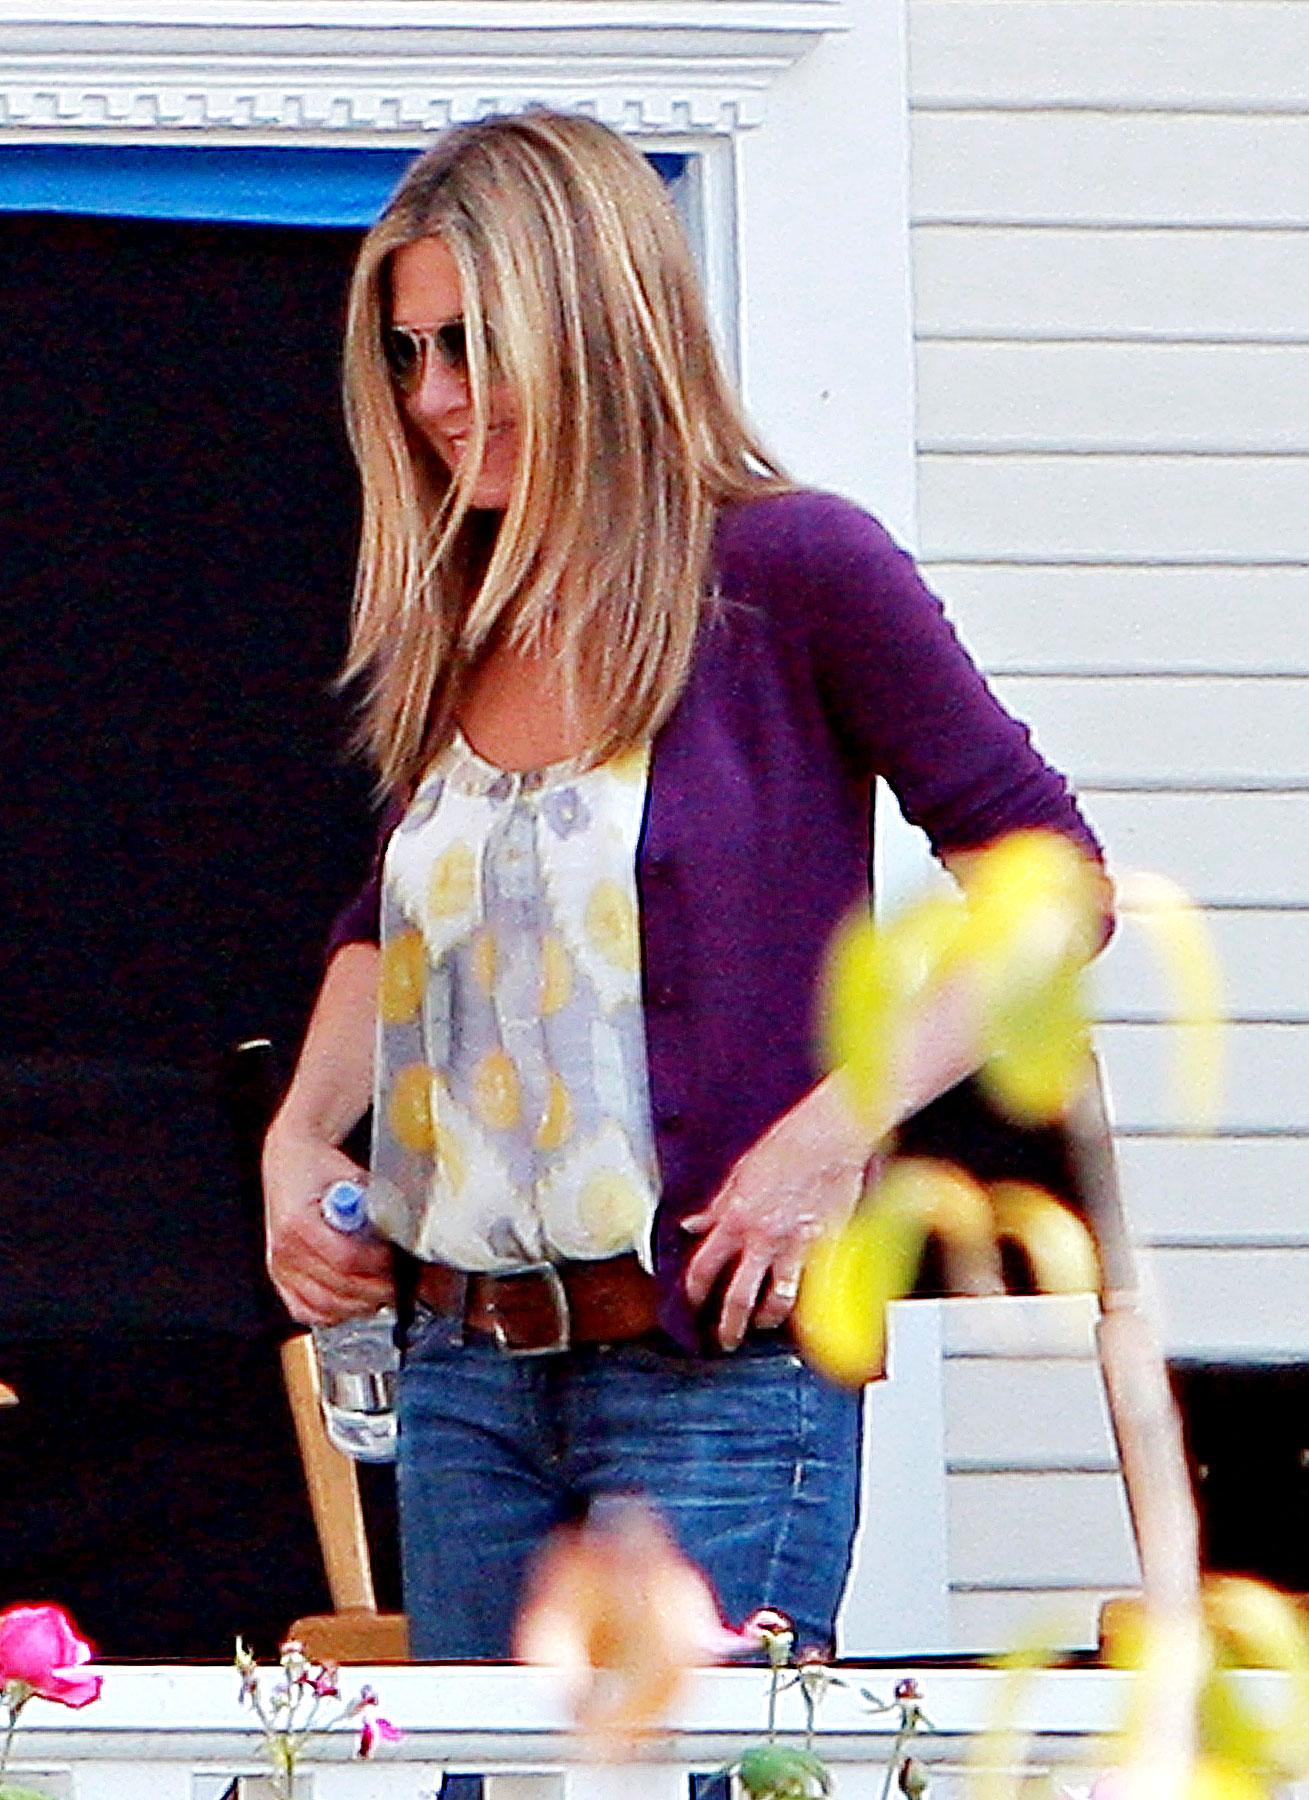 PHOTO GALLERY: Jennifer Aniston Goes Back to 'The Baster'